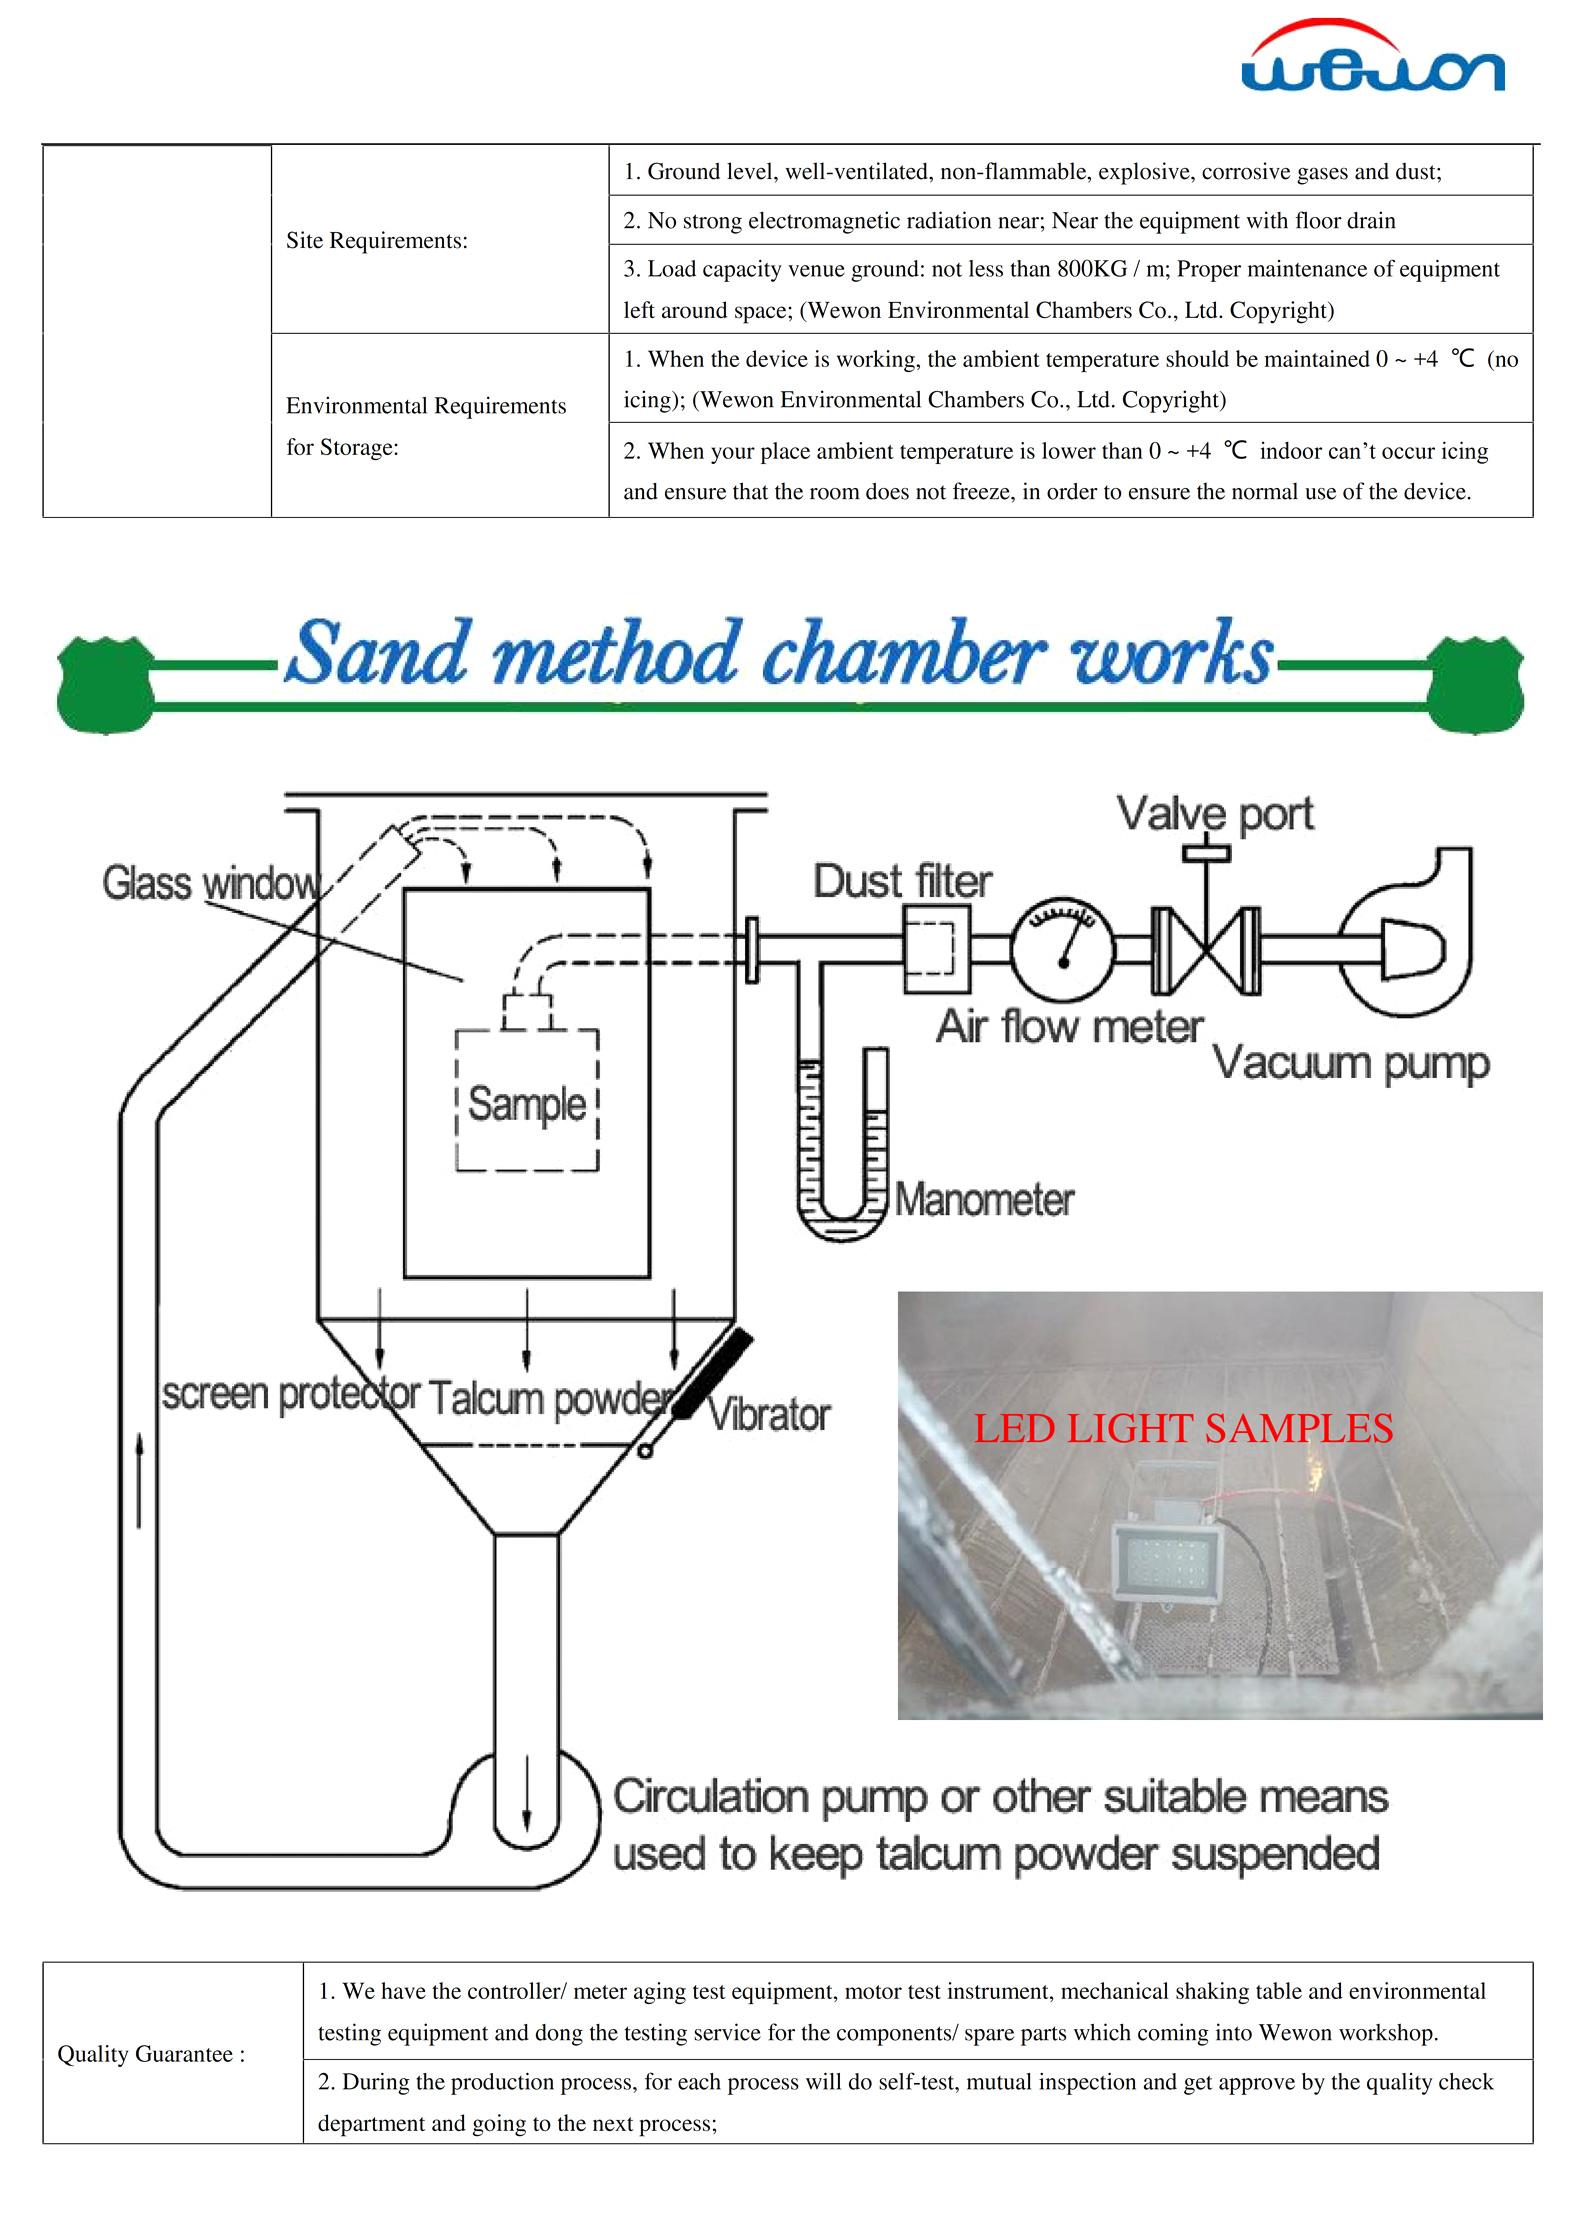 Rain Test Chamber | Wewon Environmental Chambers Co  Ltd